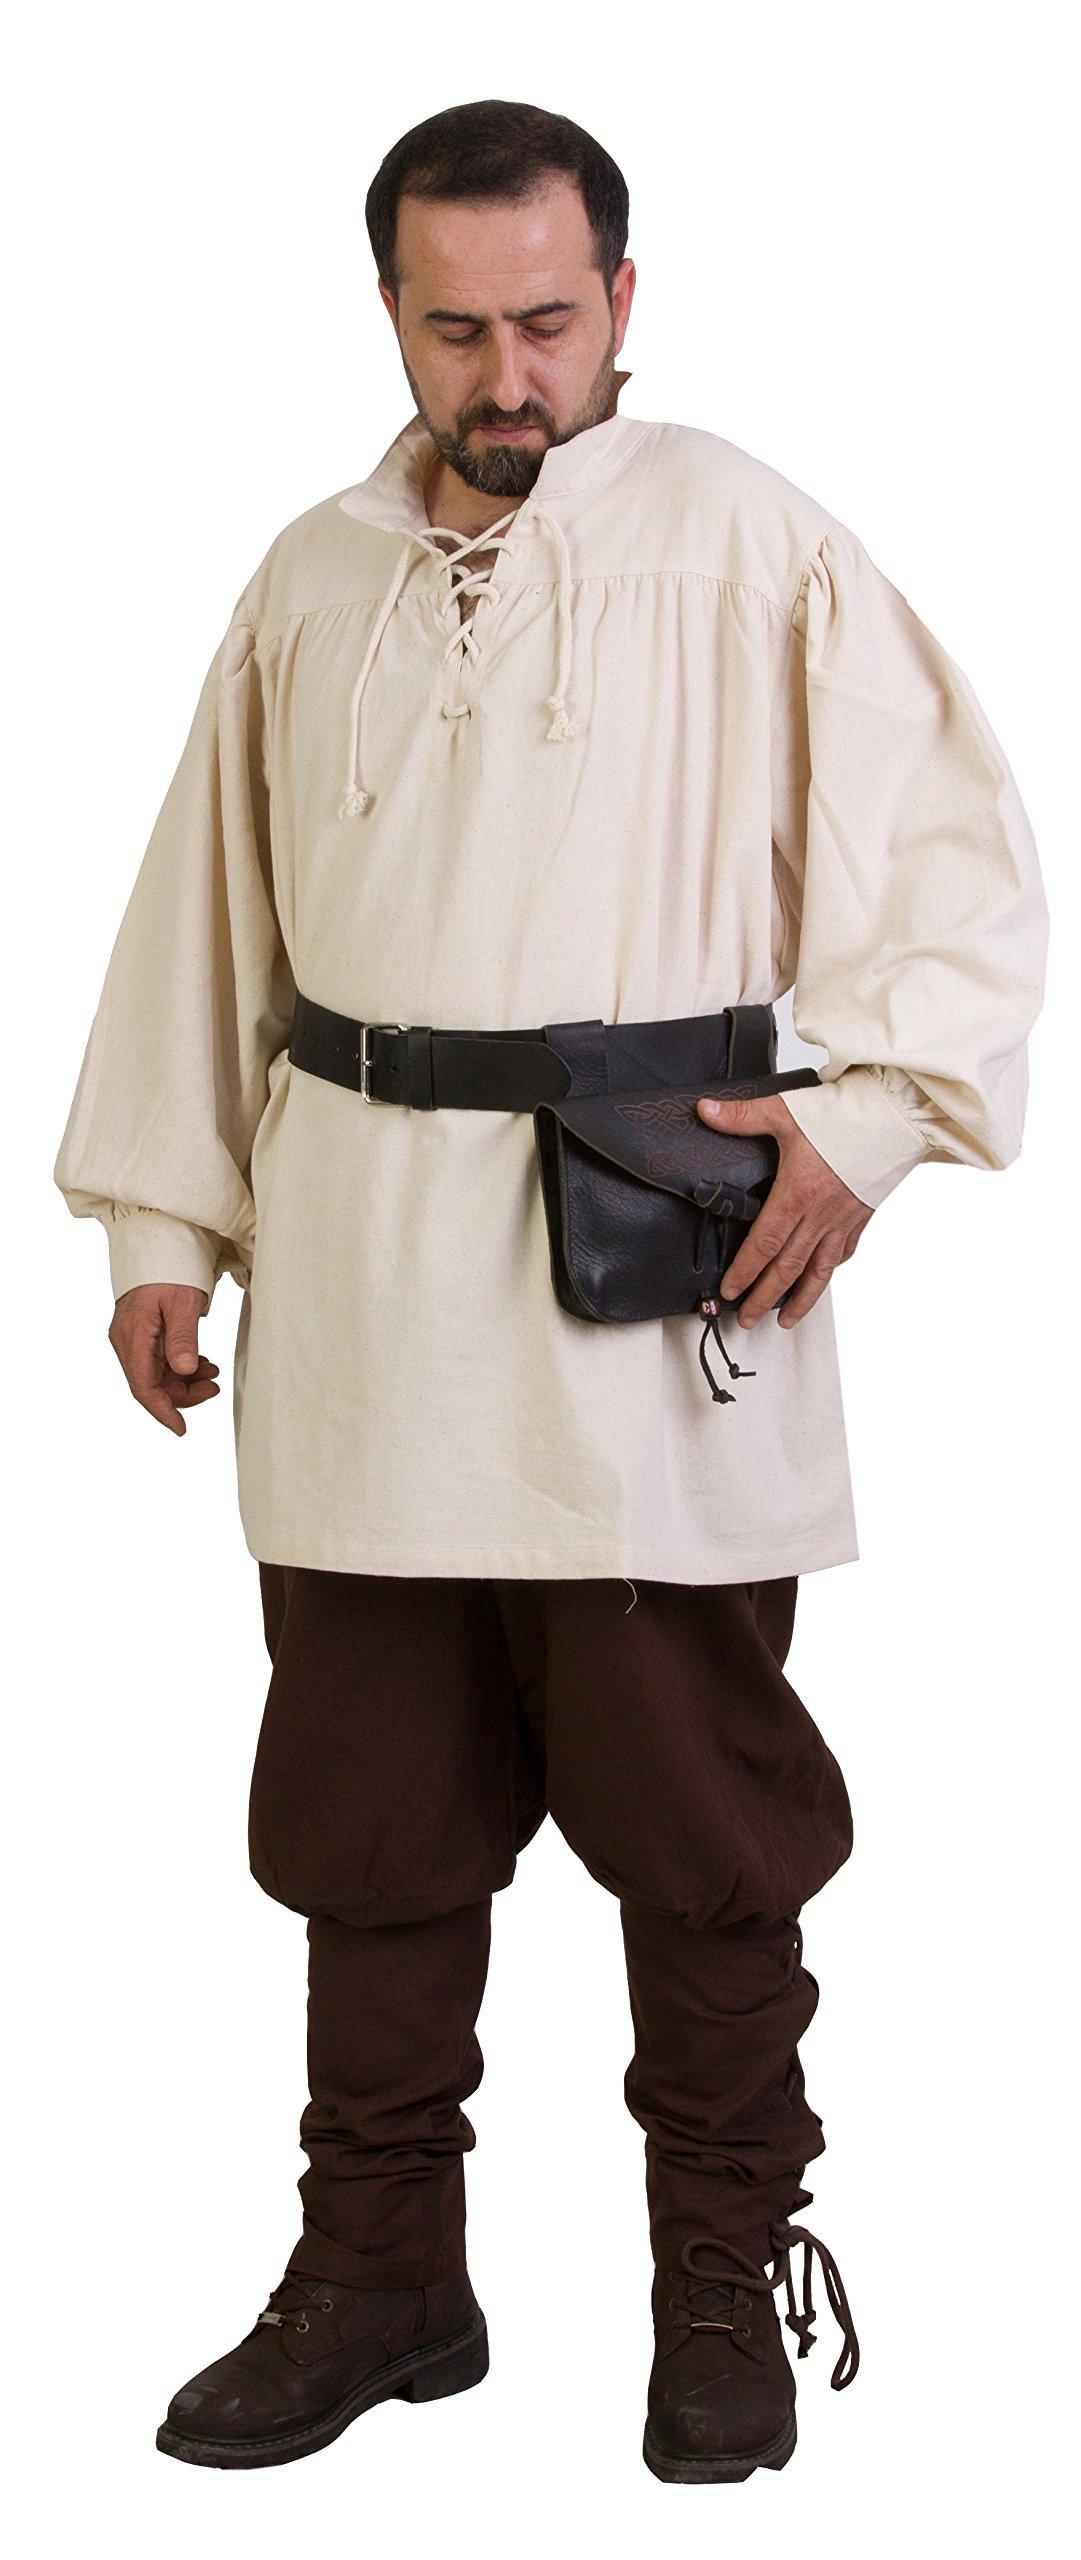 byCalvina - Calvina Costumes ERMES Medieval Viking LARP Pirate Cotton Man Shirt - Made in Turkey-Nat-2XL by byCalvina - Calvina Costumes (Image #4)